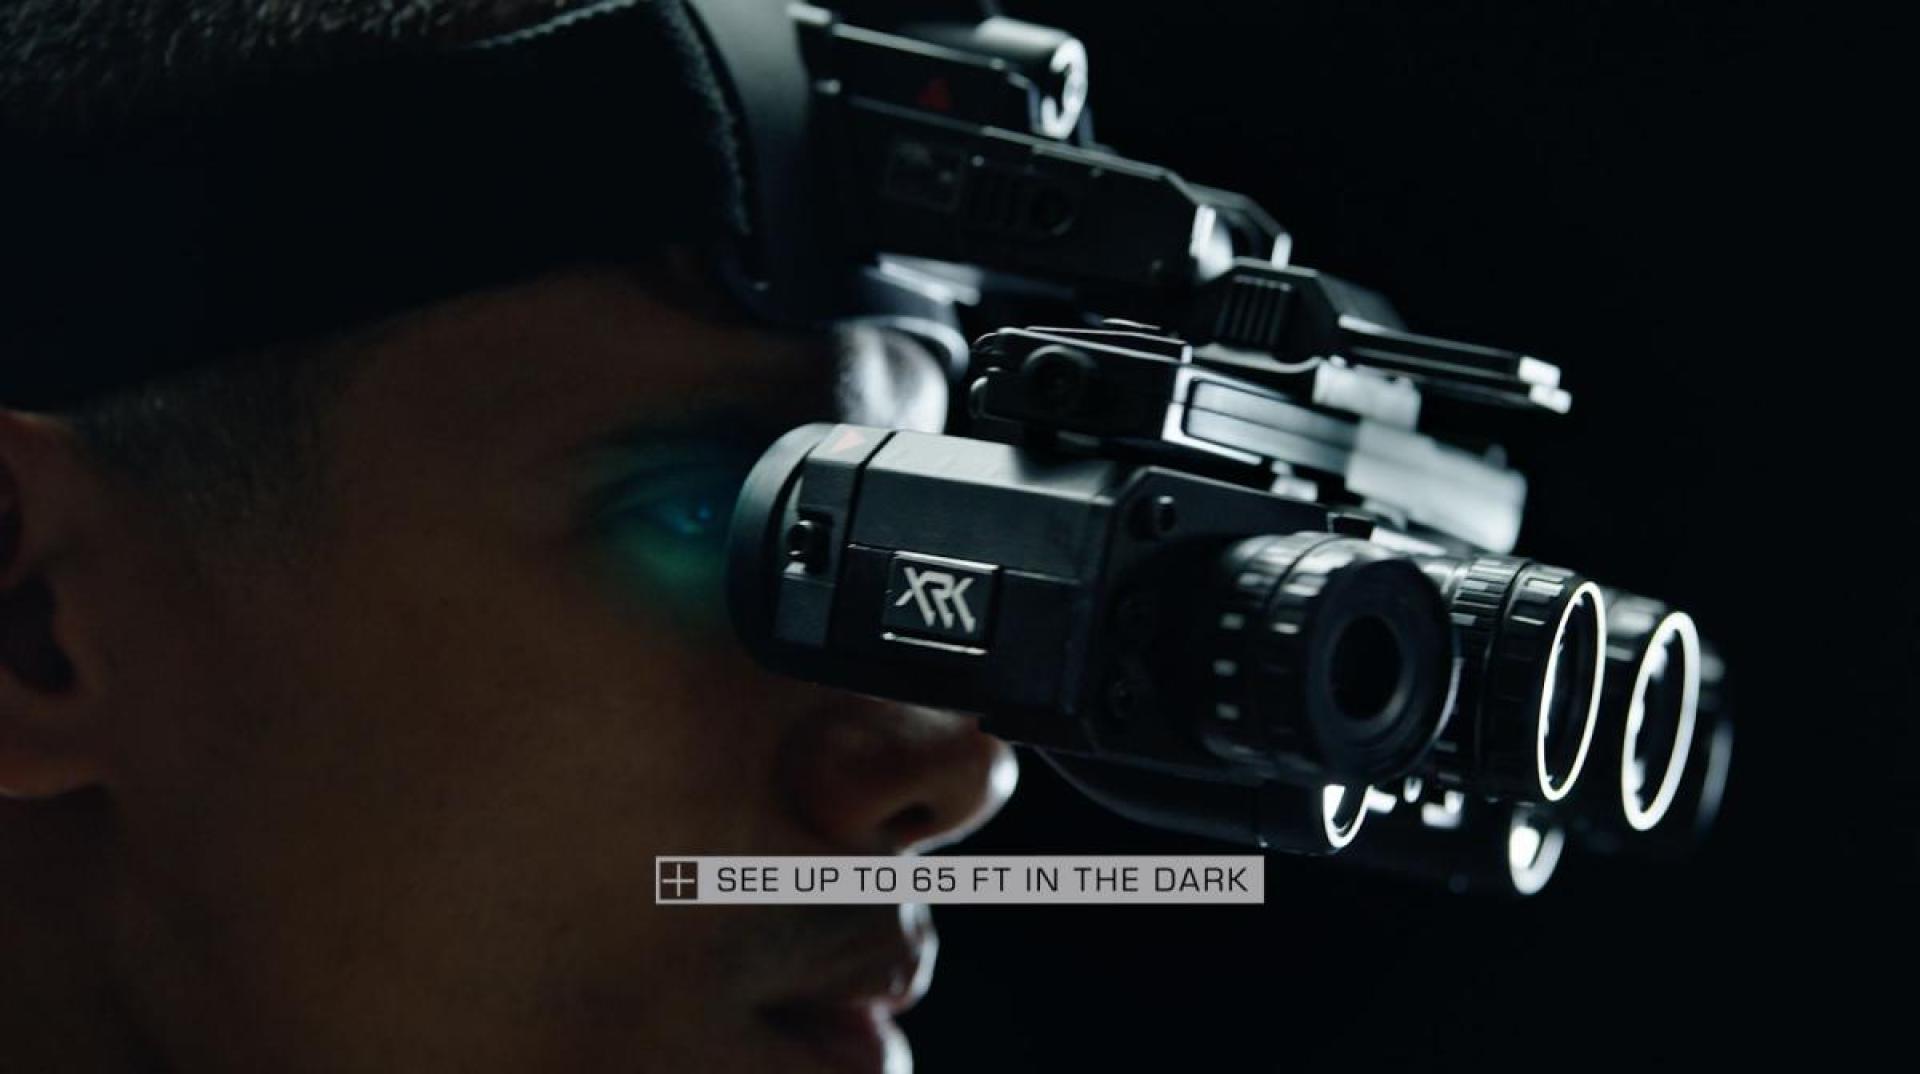 『Call of Duty:Modern Wafare』Dark Edition(ダークエディション)ナイトビジョンゴーグル